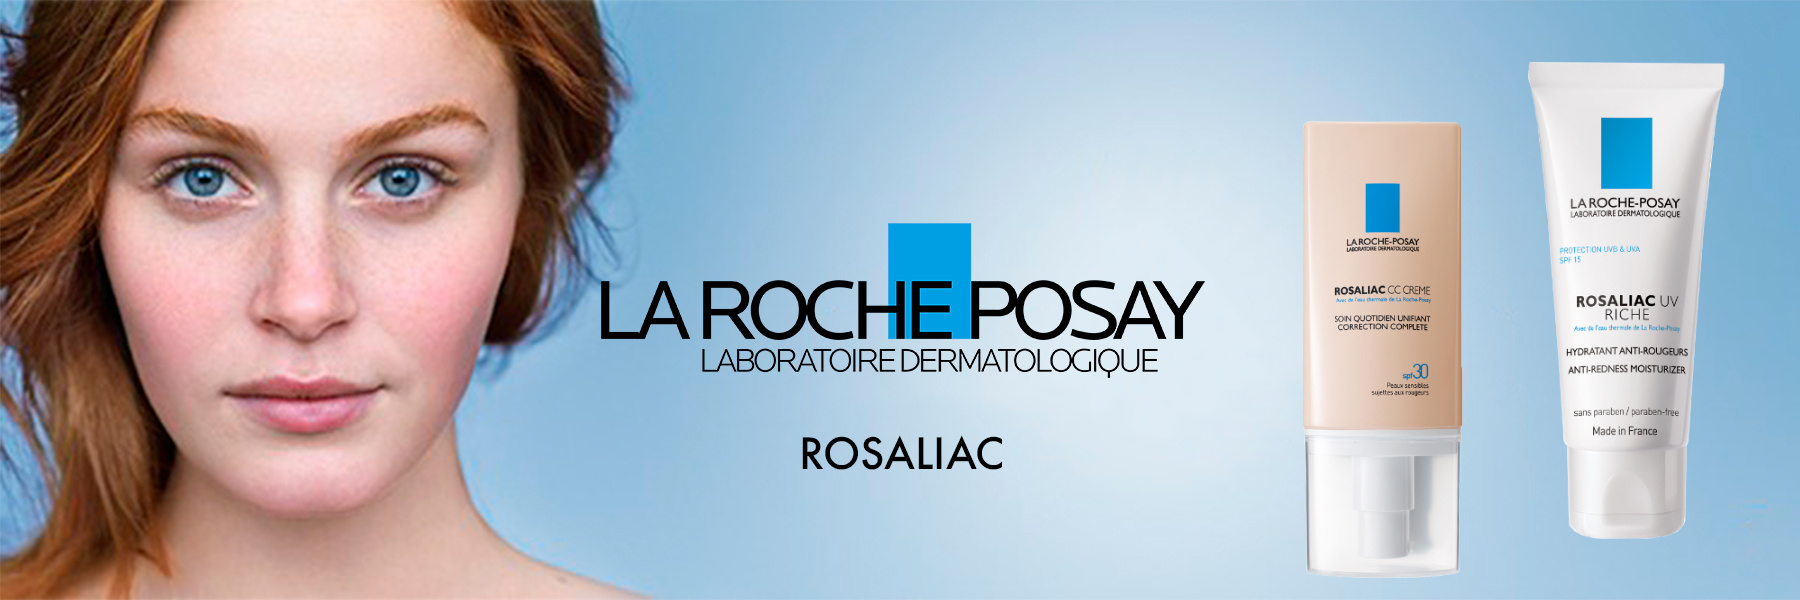 La Roche Posay Rosaliac